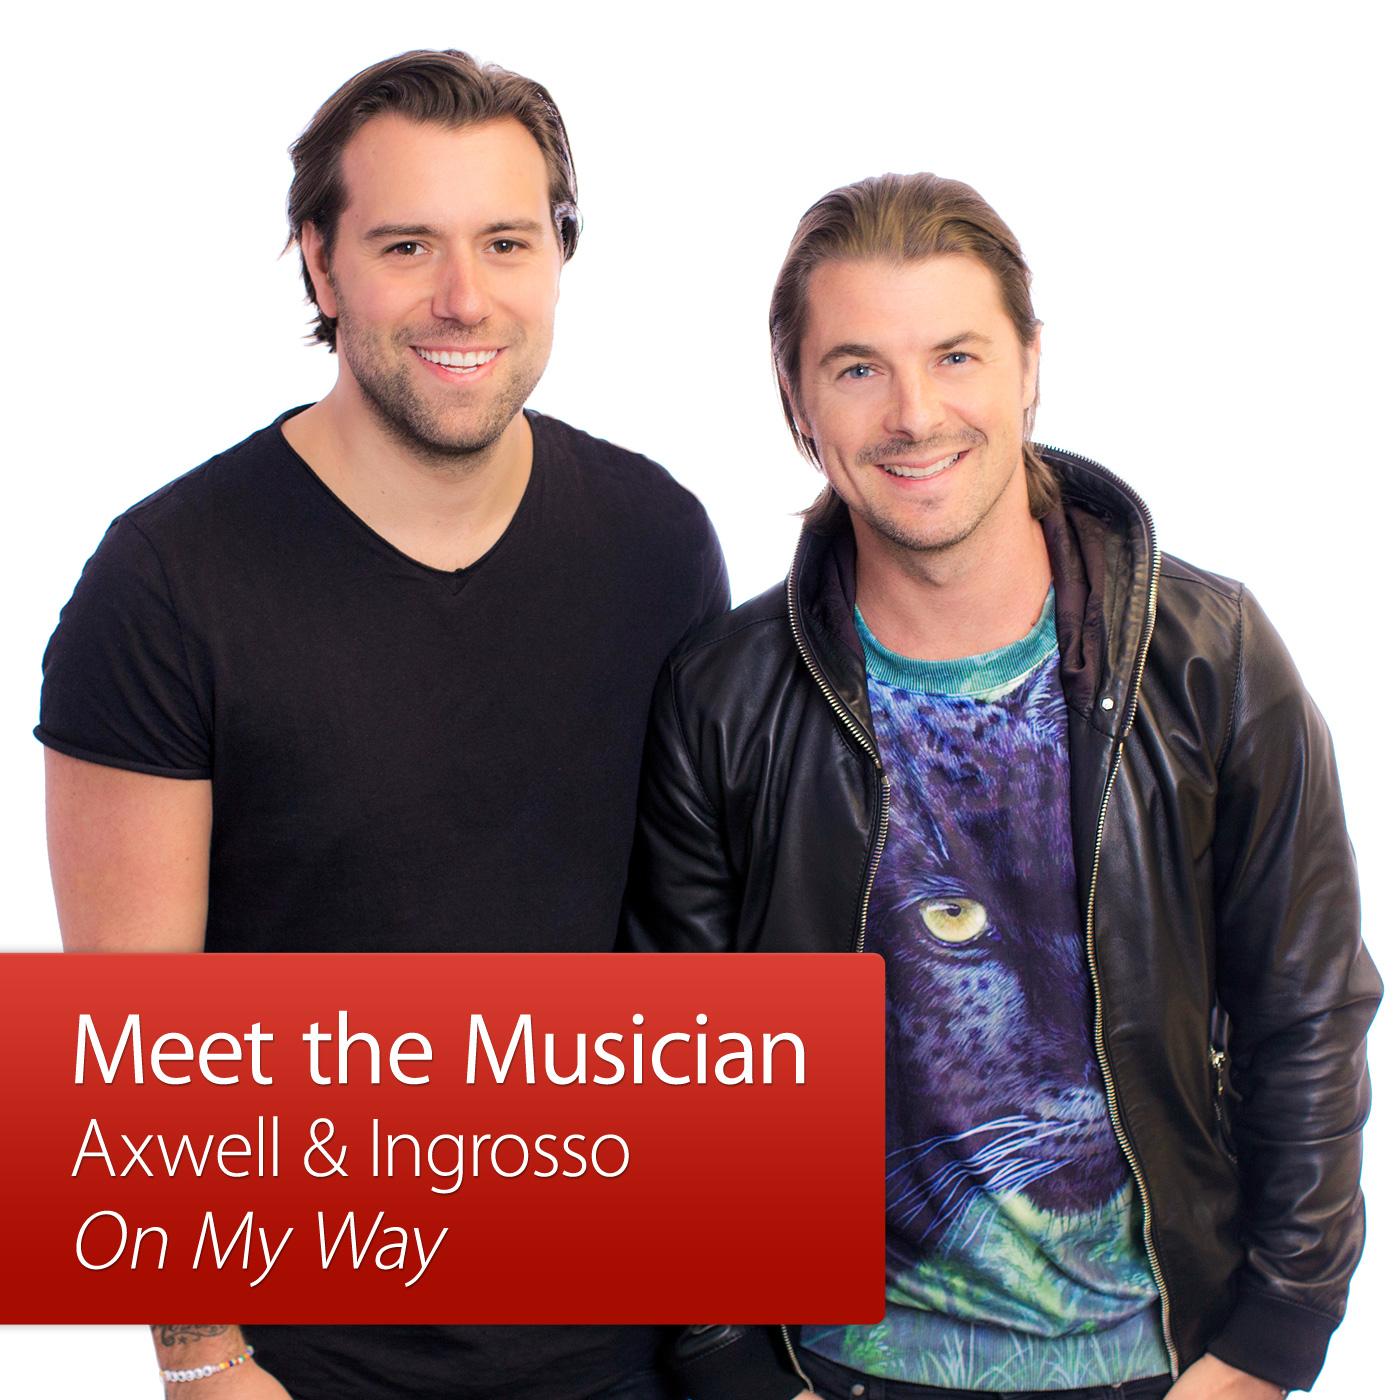 Axwell & Ingrosso: Meet the Musician